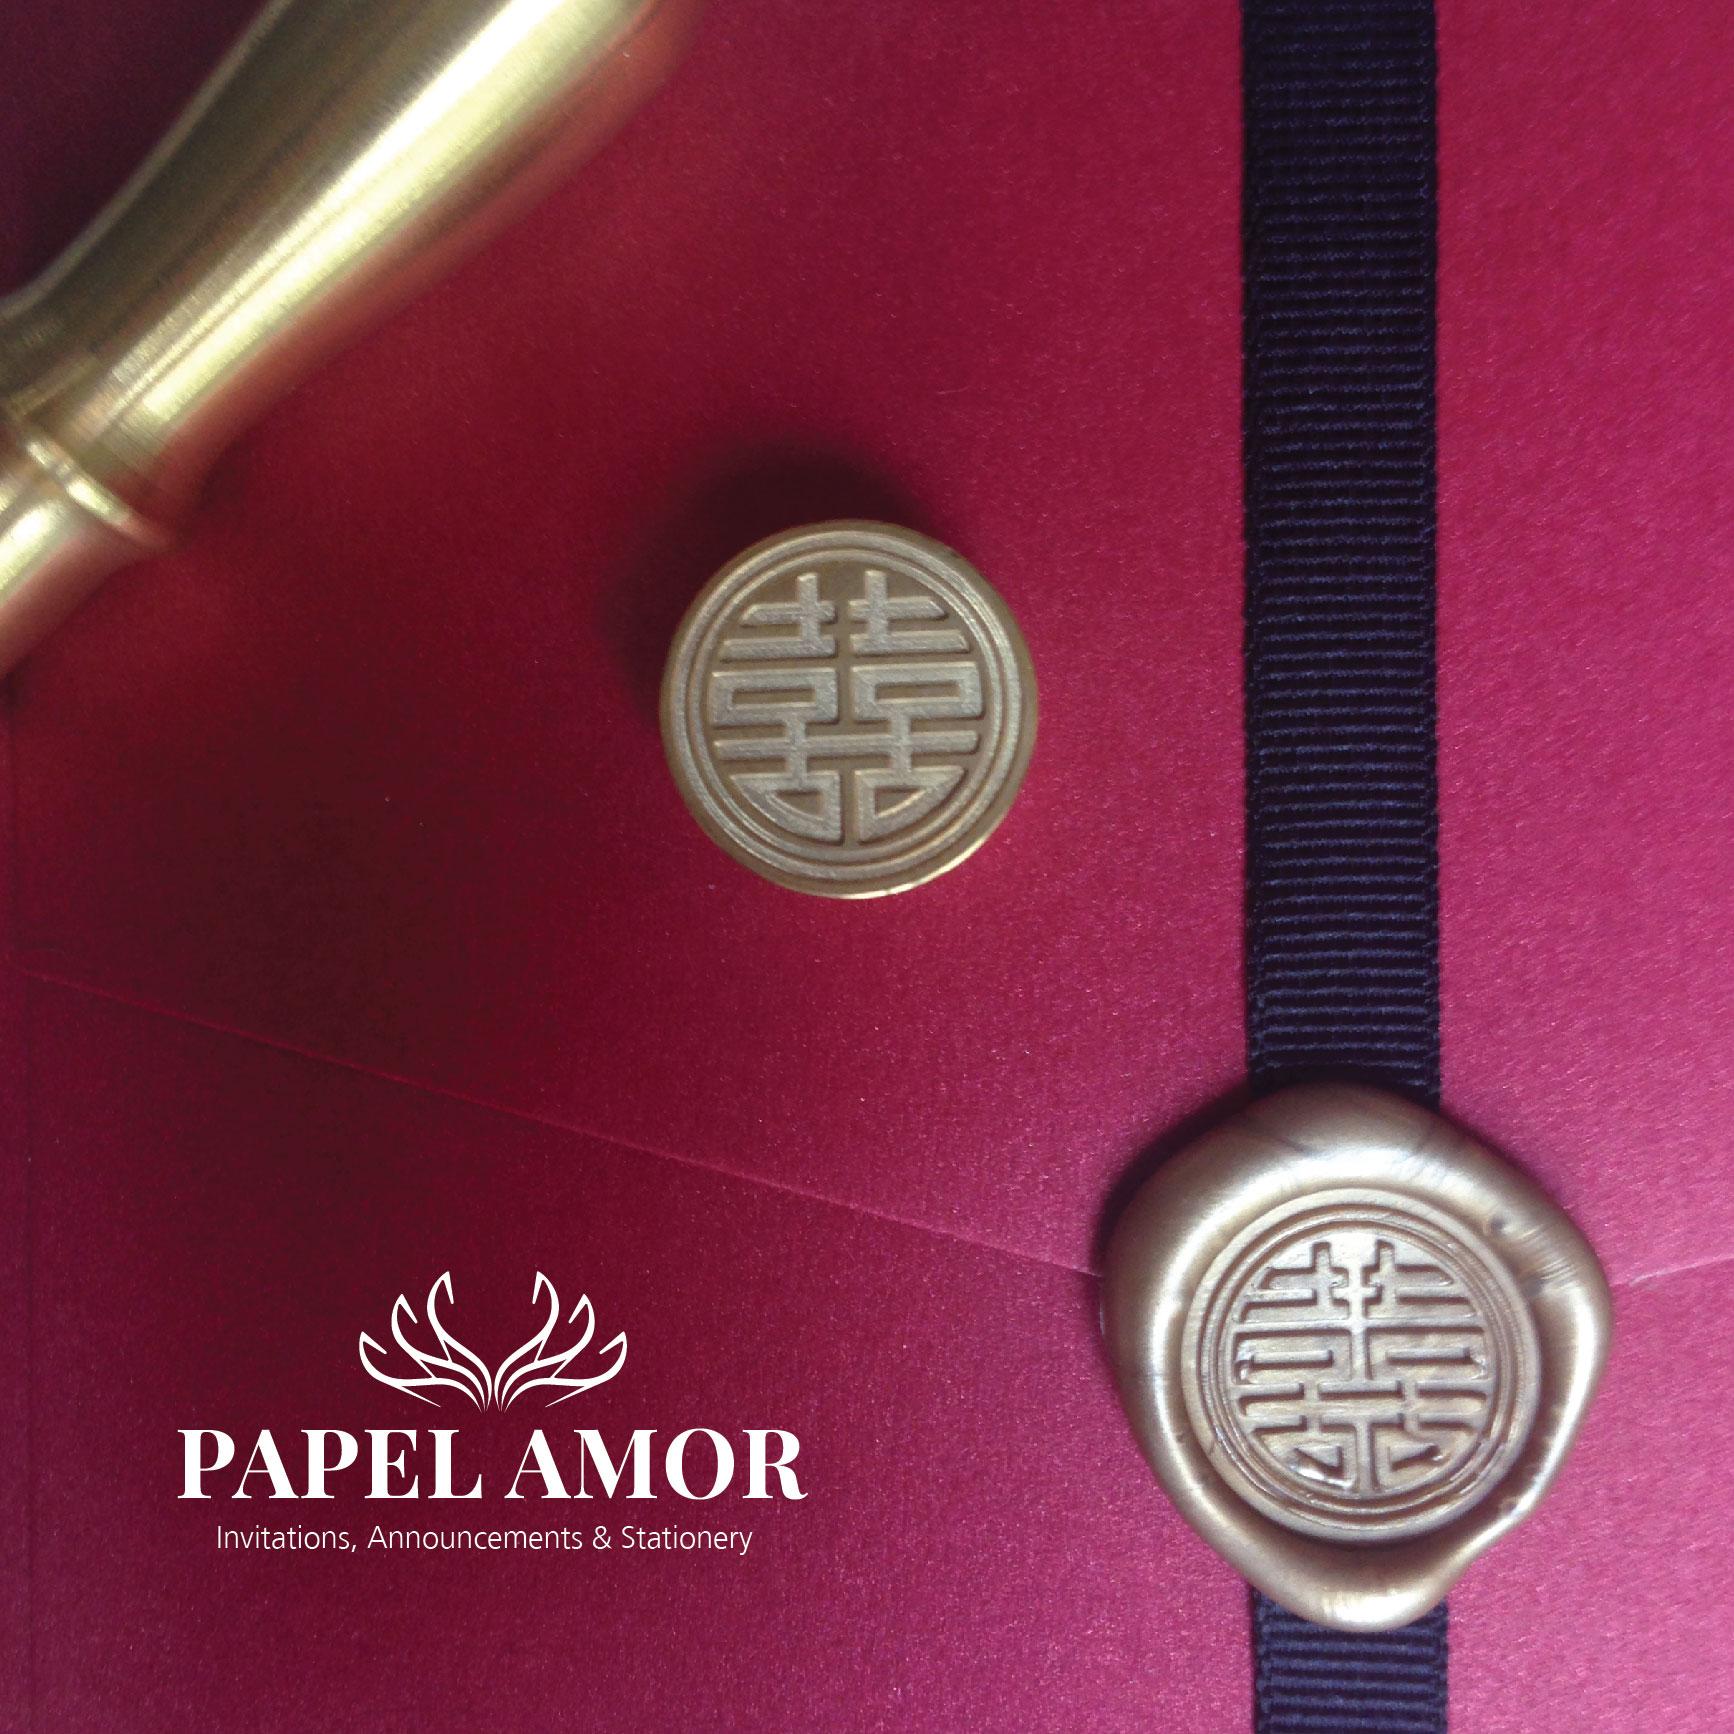 double happiness symbol wax seal-01.JPG